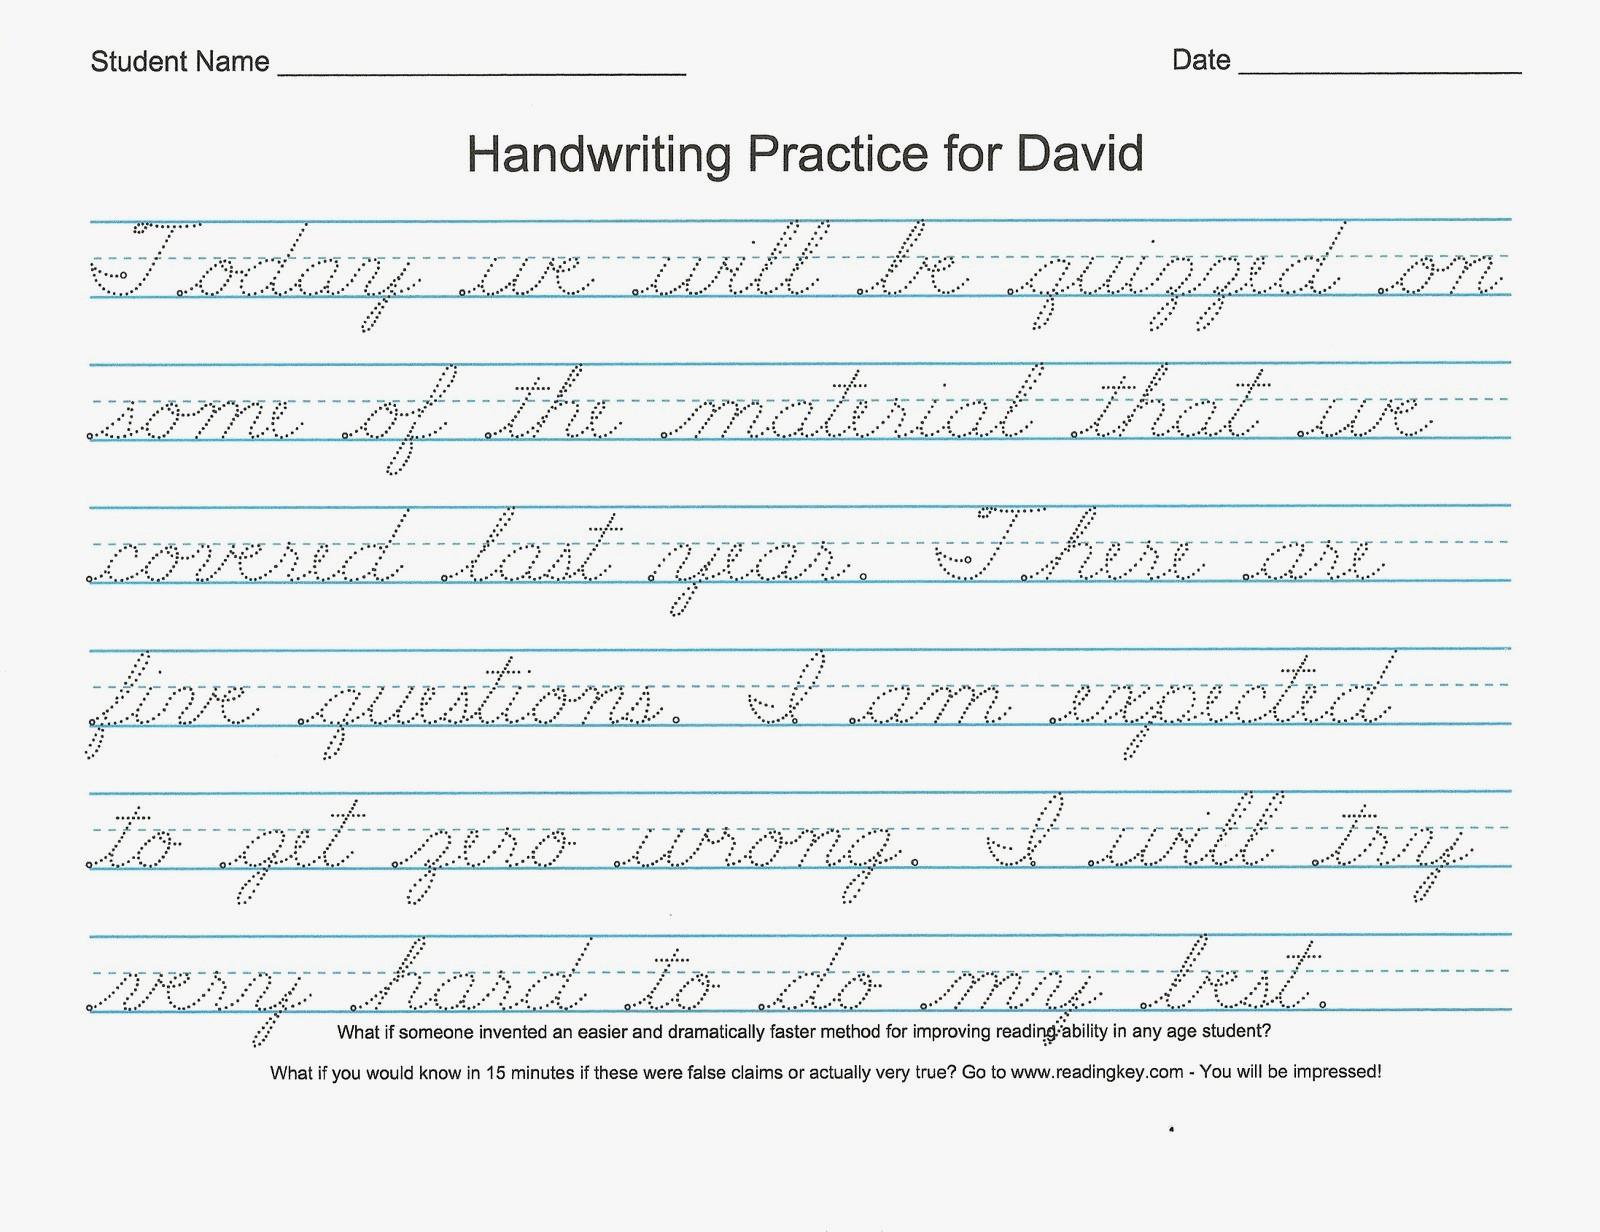 54 Unique Of Free Printable Cursive Handwriting Worksheets Pic | Free Printable Cursive Writing Worksheets For 4Th Grade